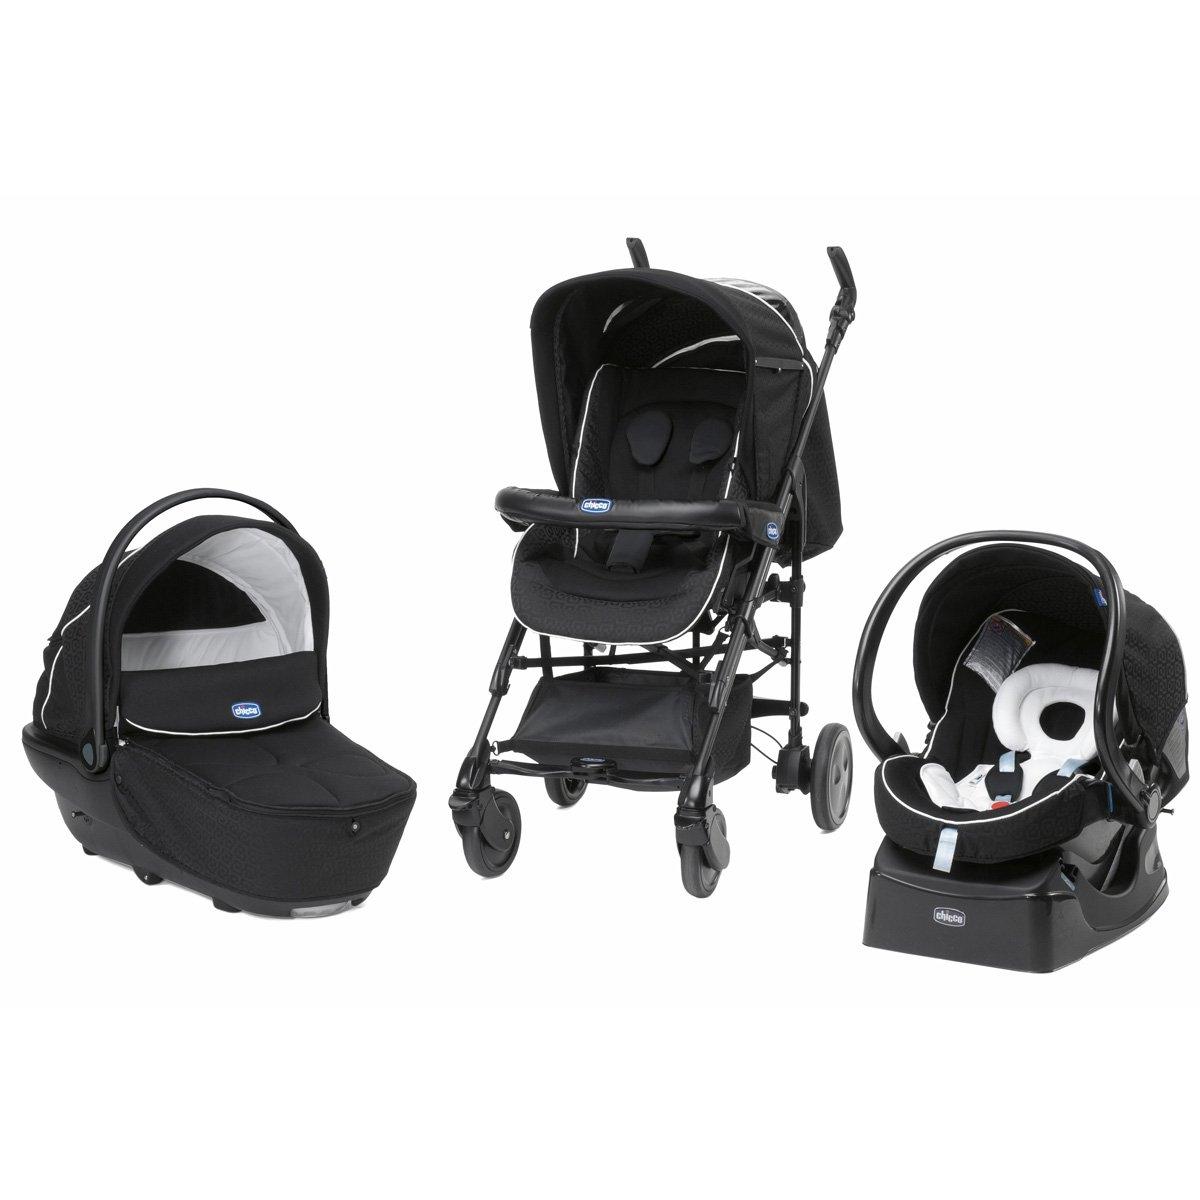 chicco trio living smart kombikinderwagen mit babyschale. Black Bedroom Furniture Sets. Home Design Ideas